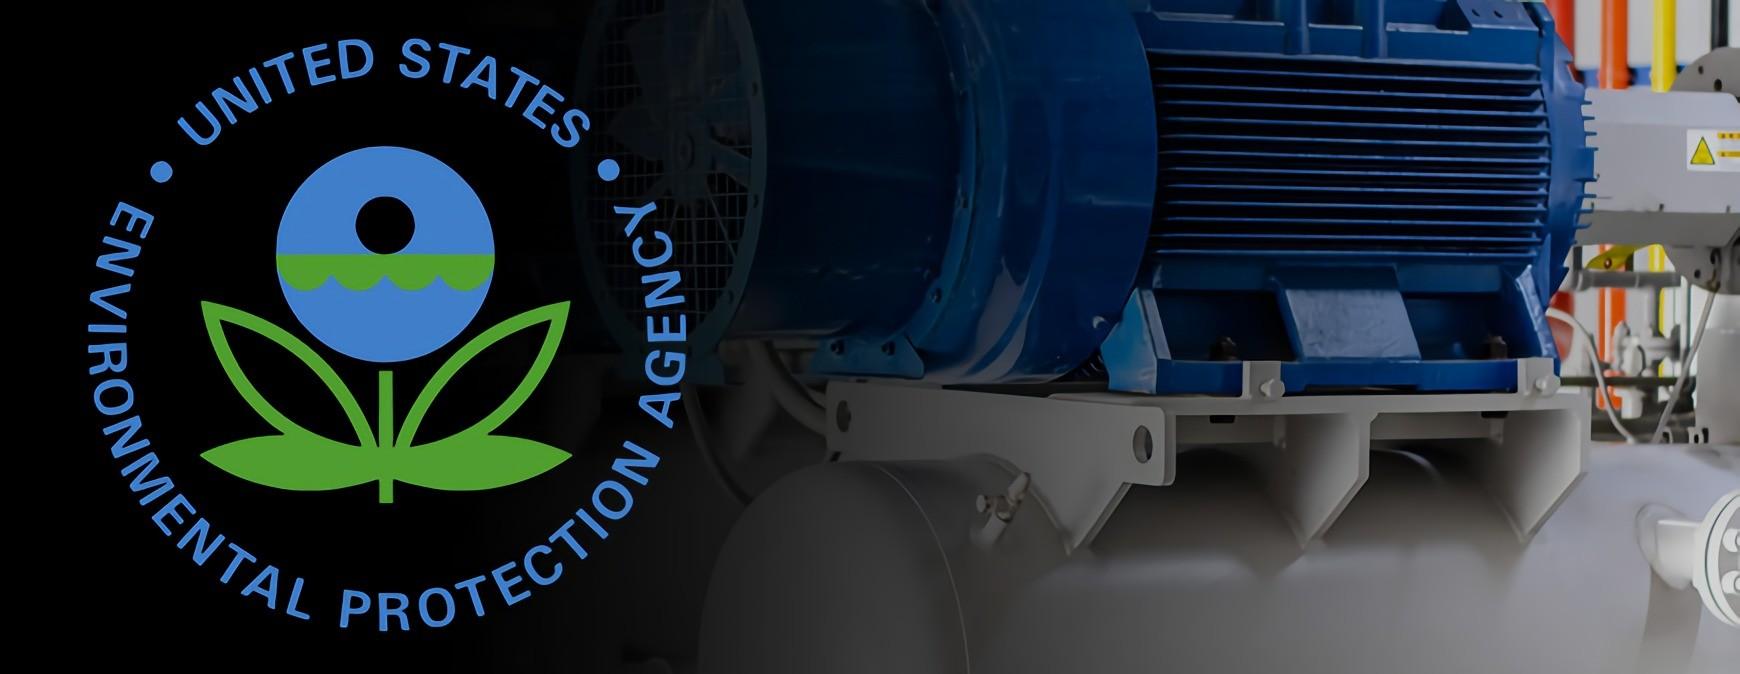 epa logo with refrigerants